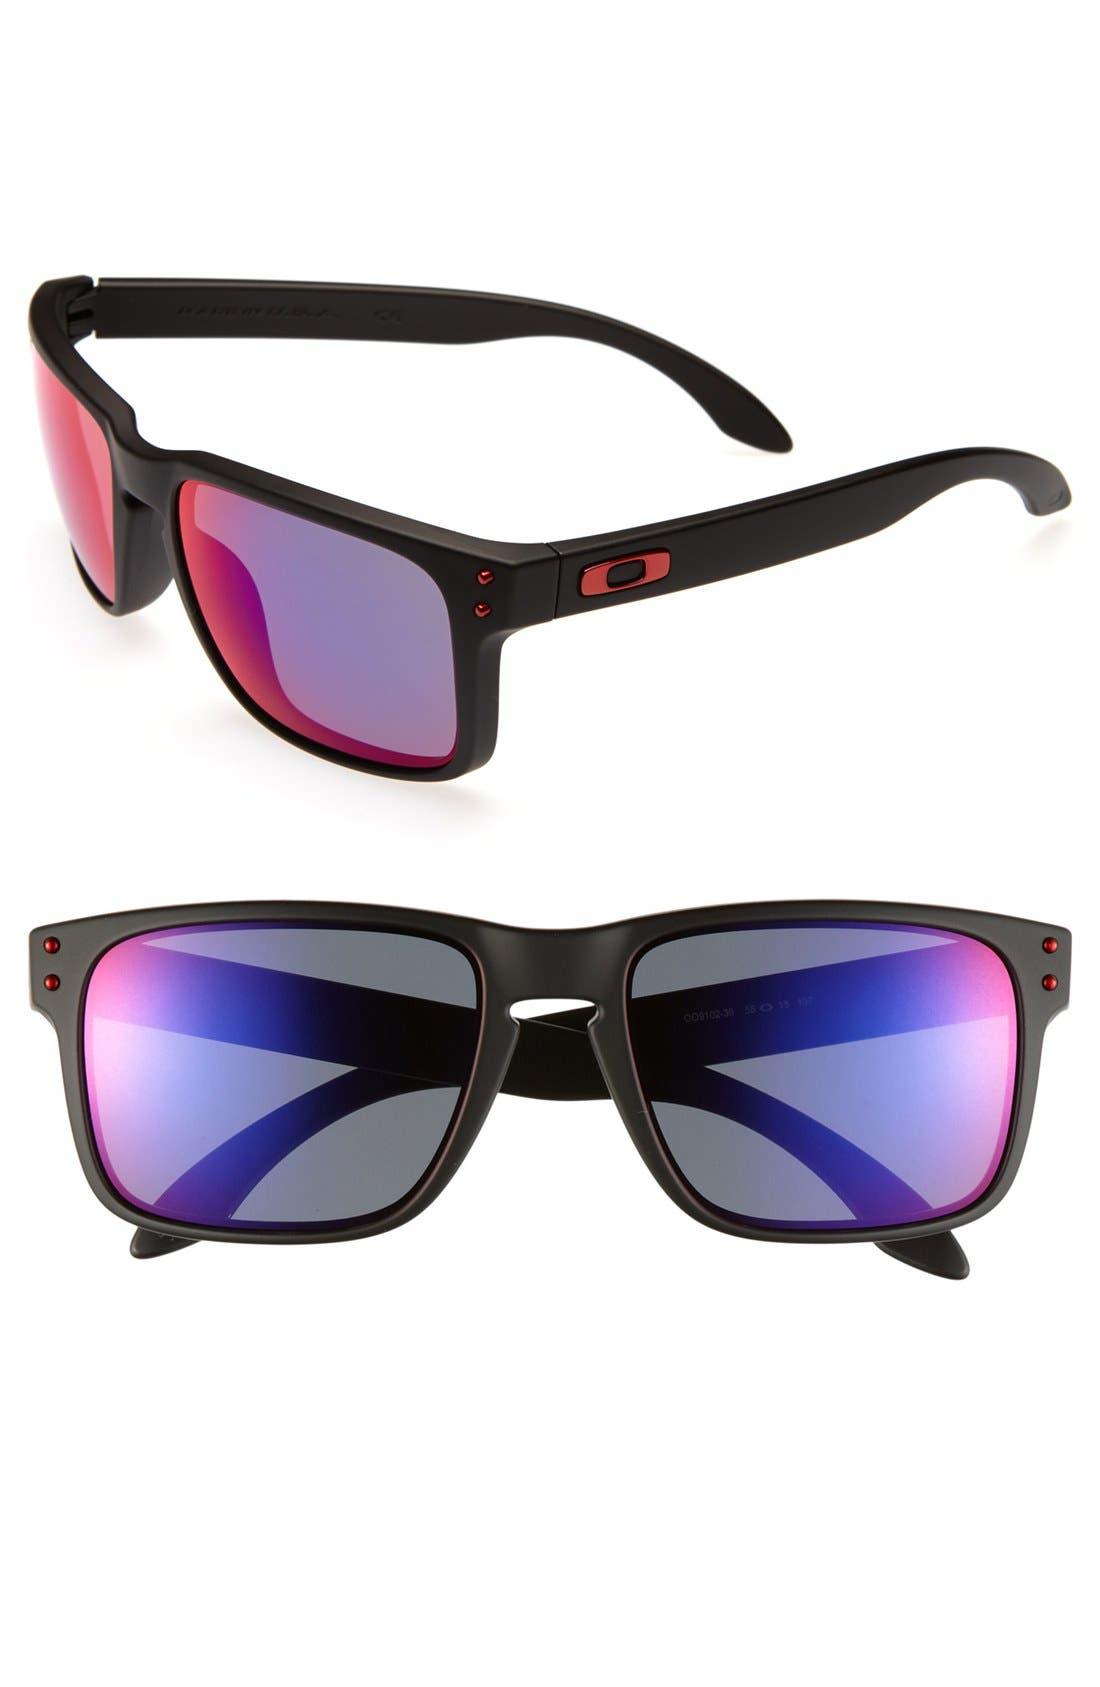 Main Image - Oakley 'Holbrook' 55mm Sunglasses